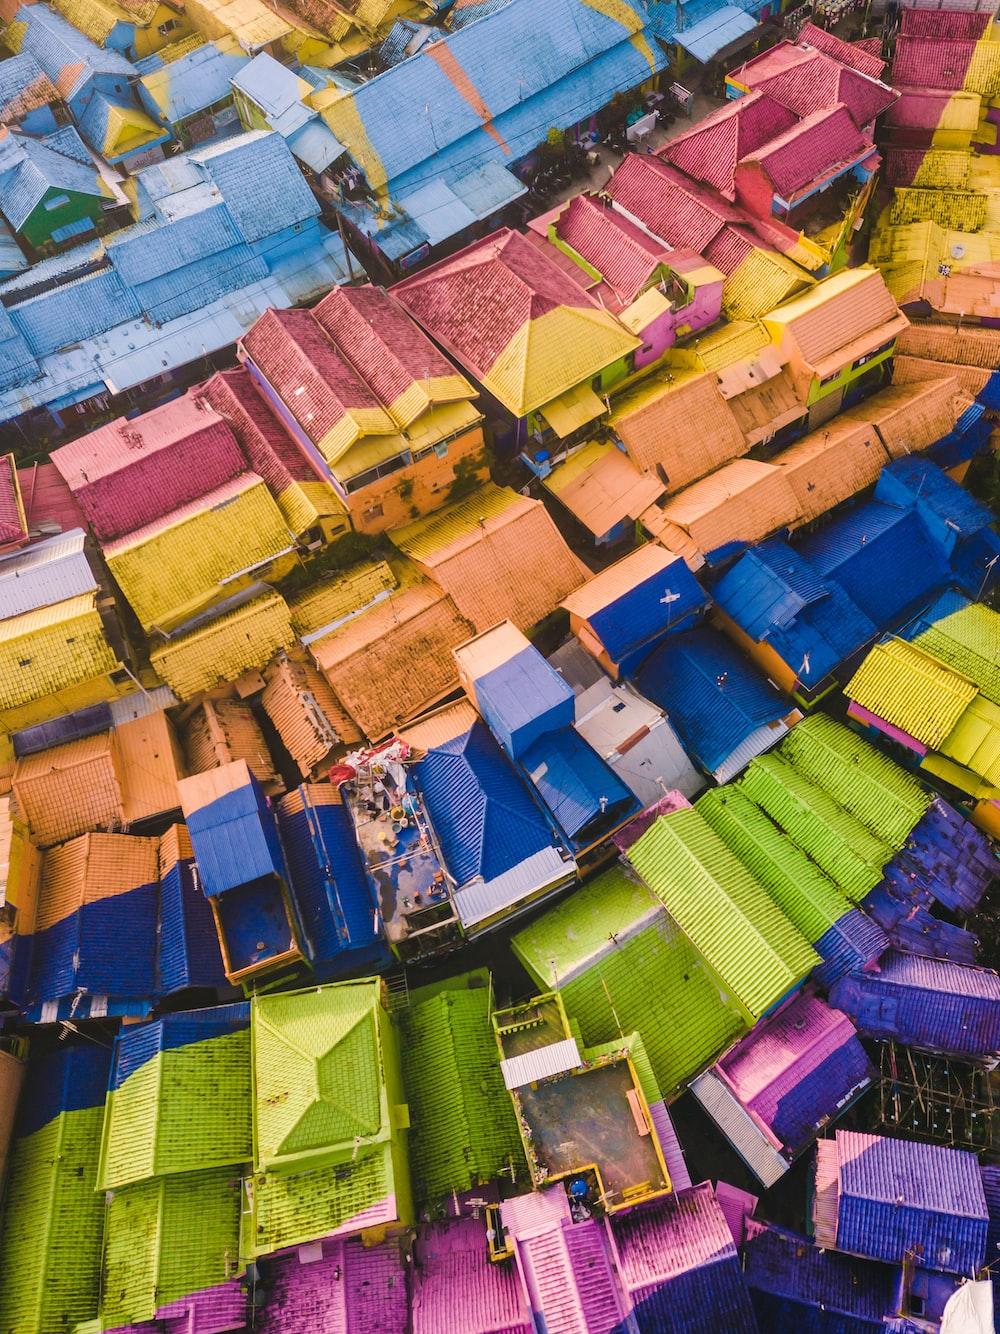 Kota Malang Pictures Download Free Images On Unsplash